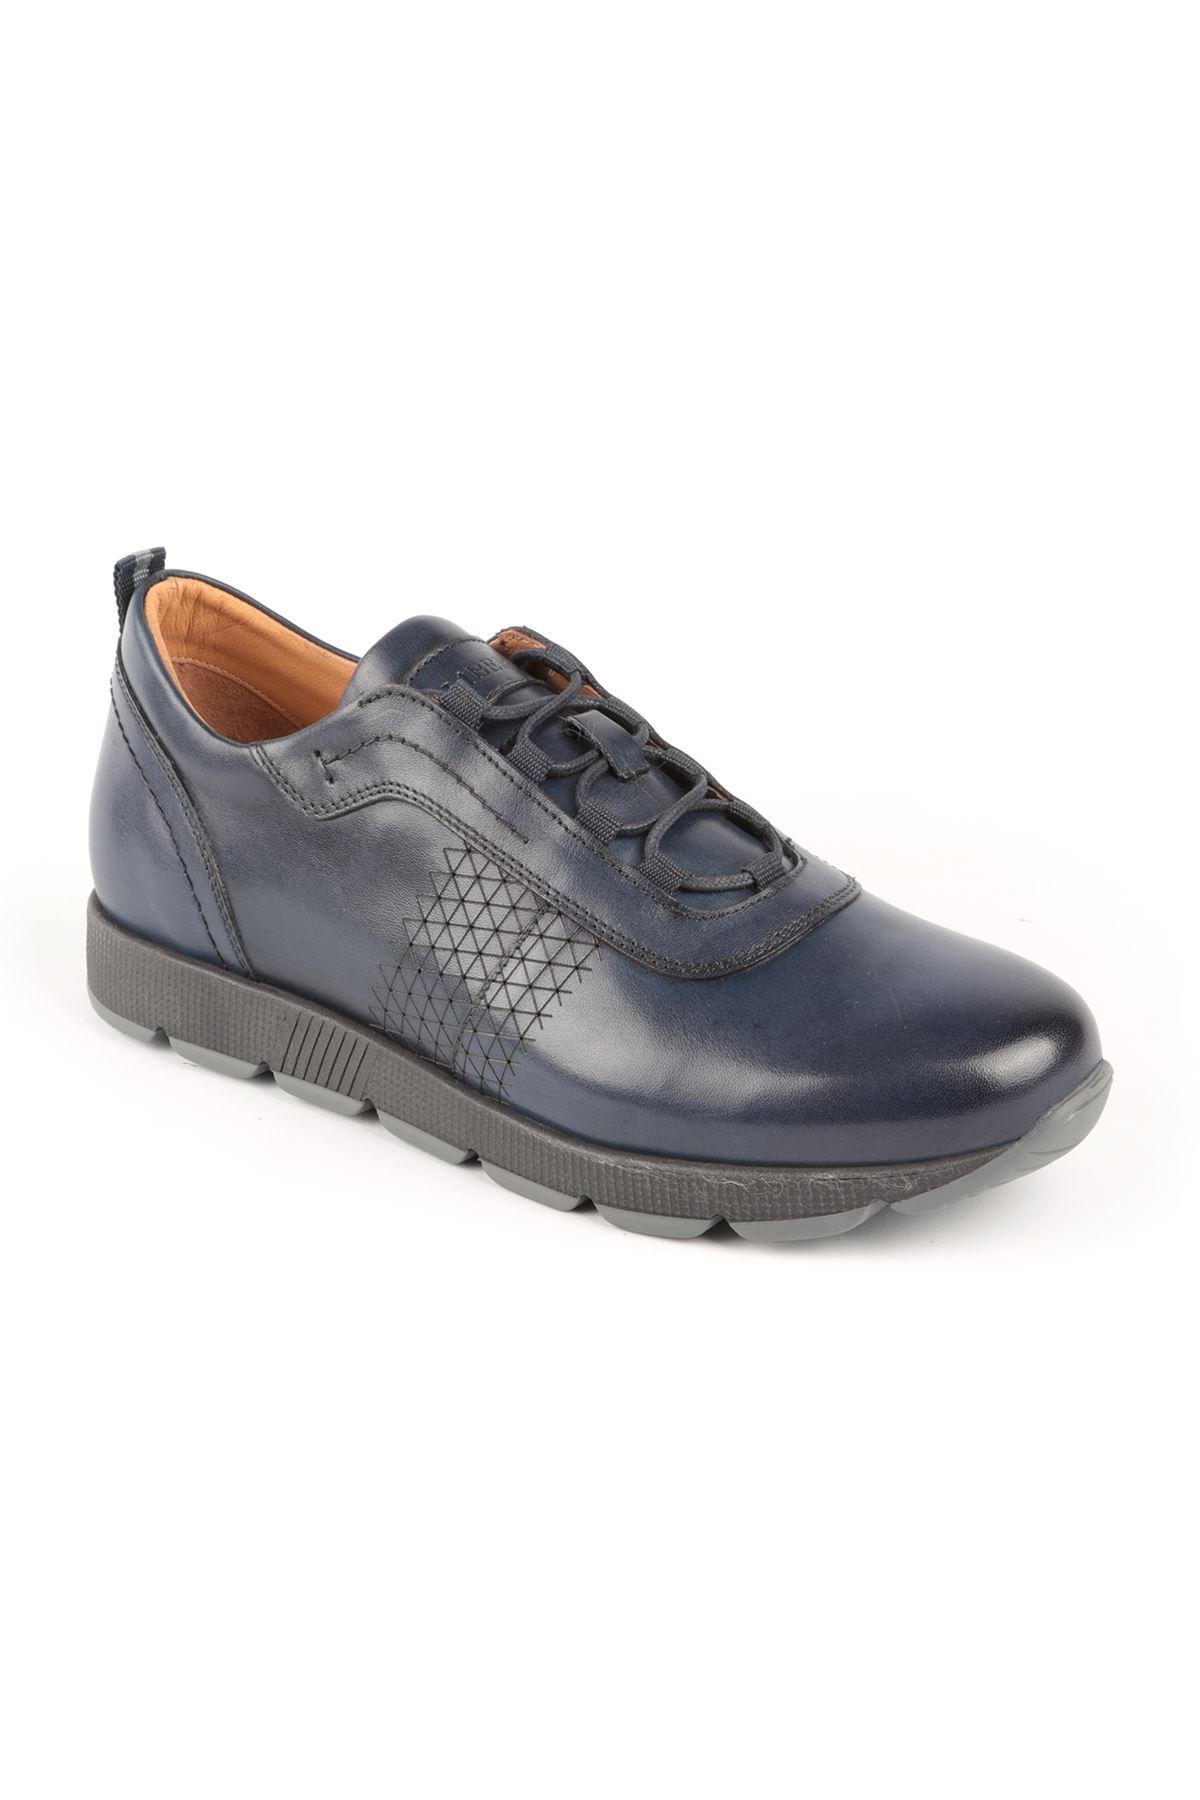 Libero L3582 Lacivert Spor Ayakkabı